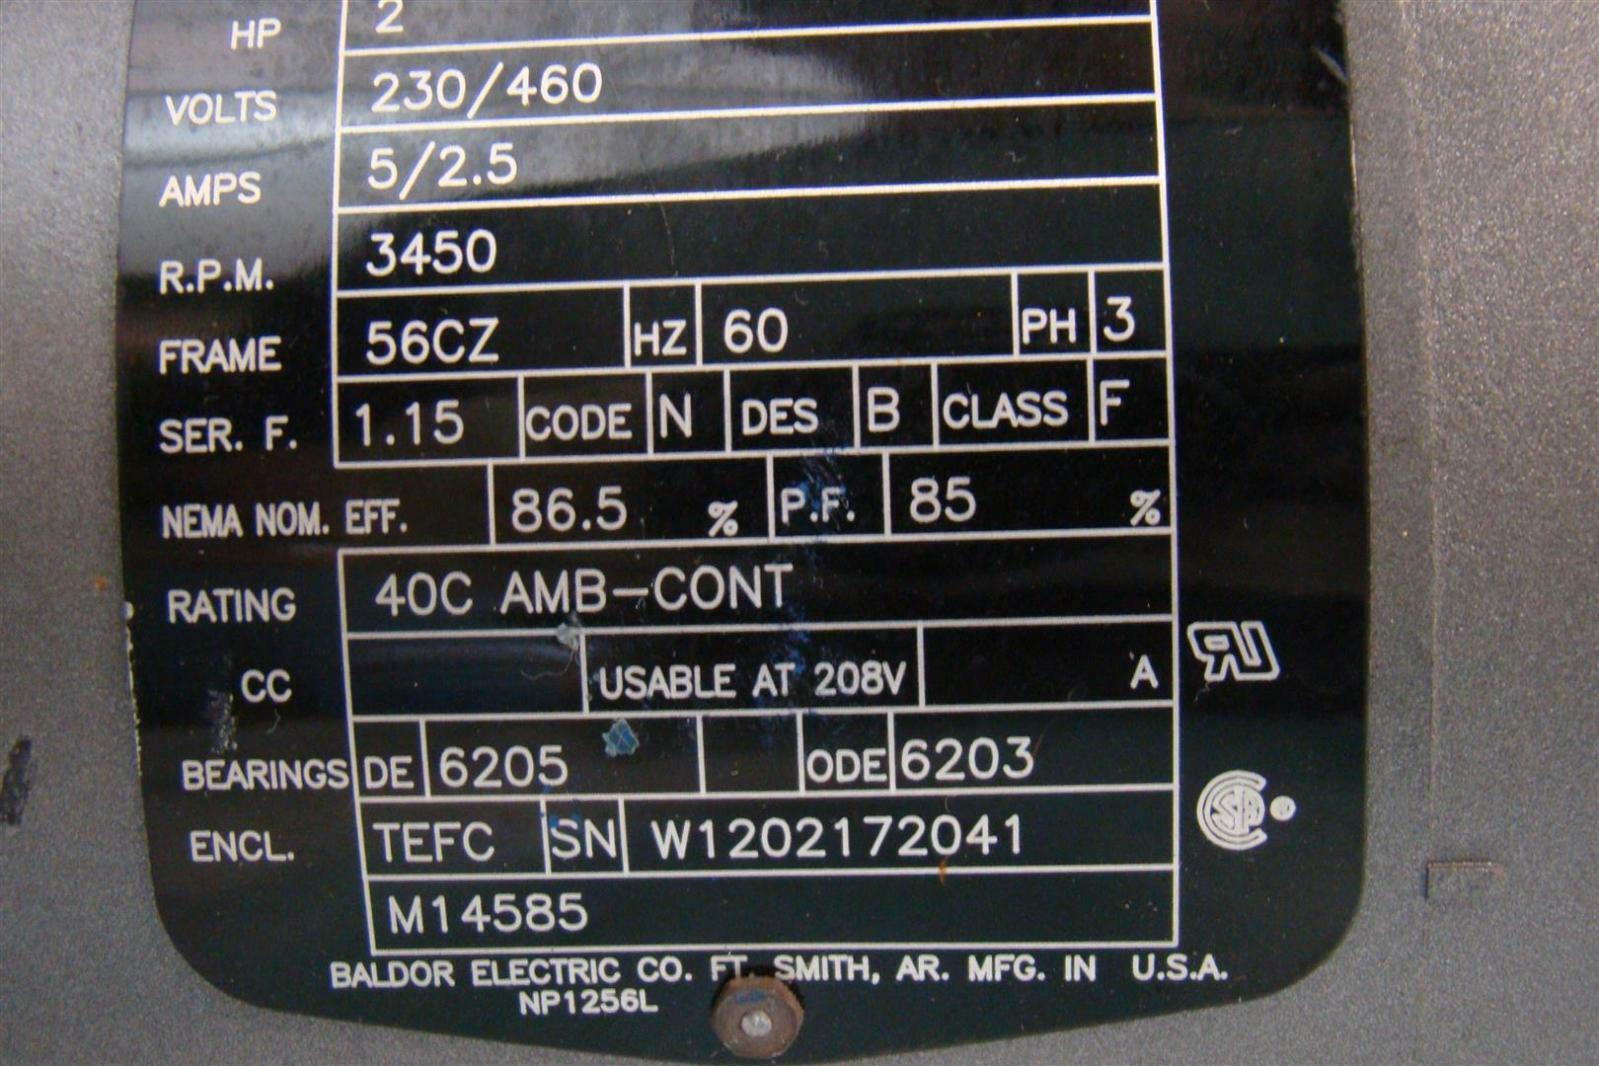 Baldor Reliancer Electric Motor 2hp 230 460v 5 2 5amps Ph3